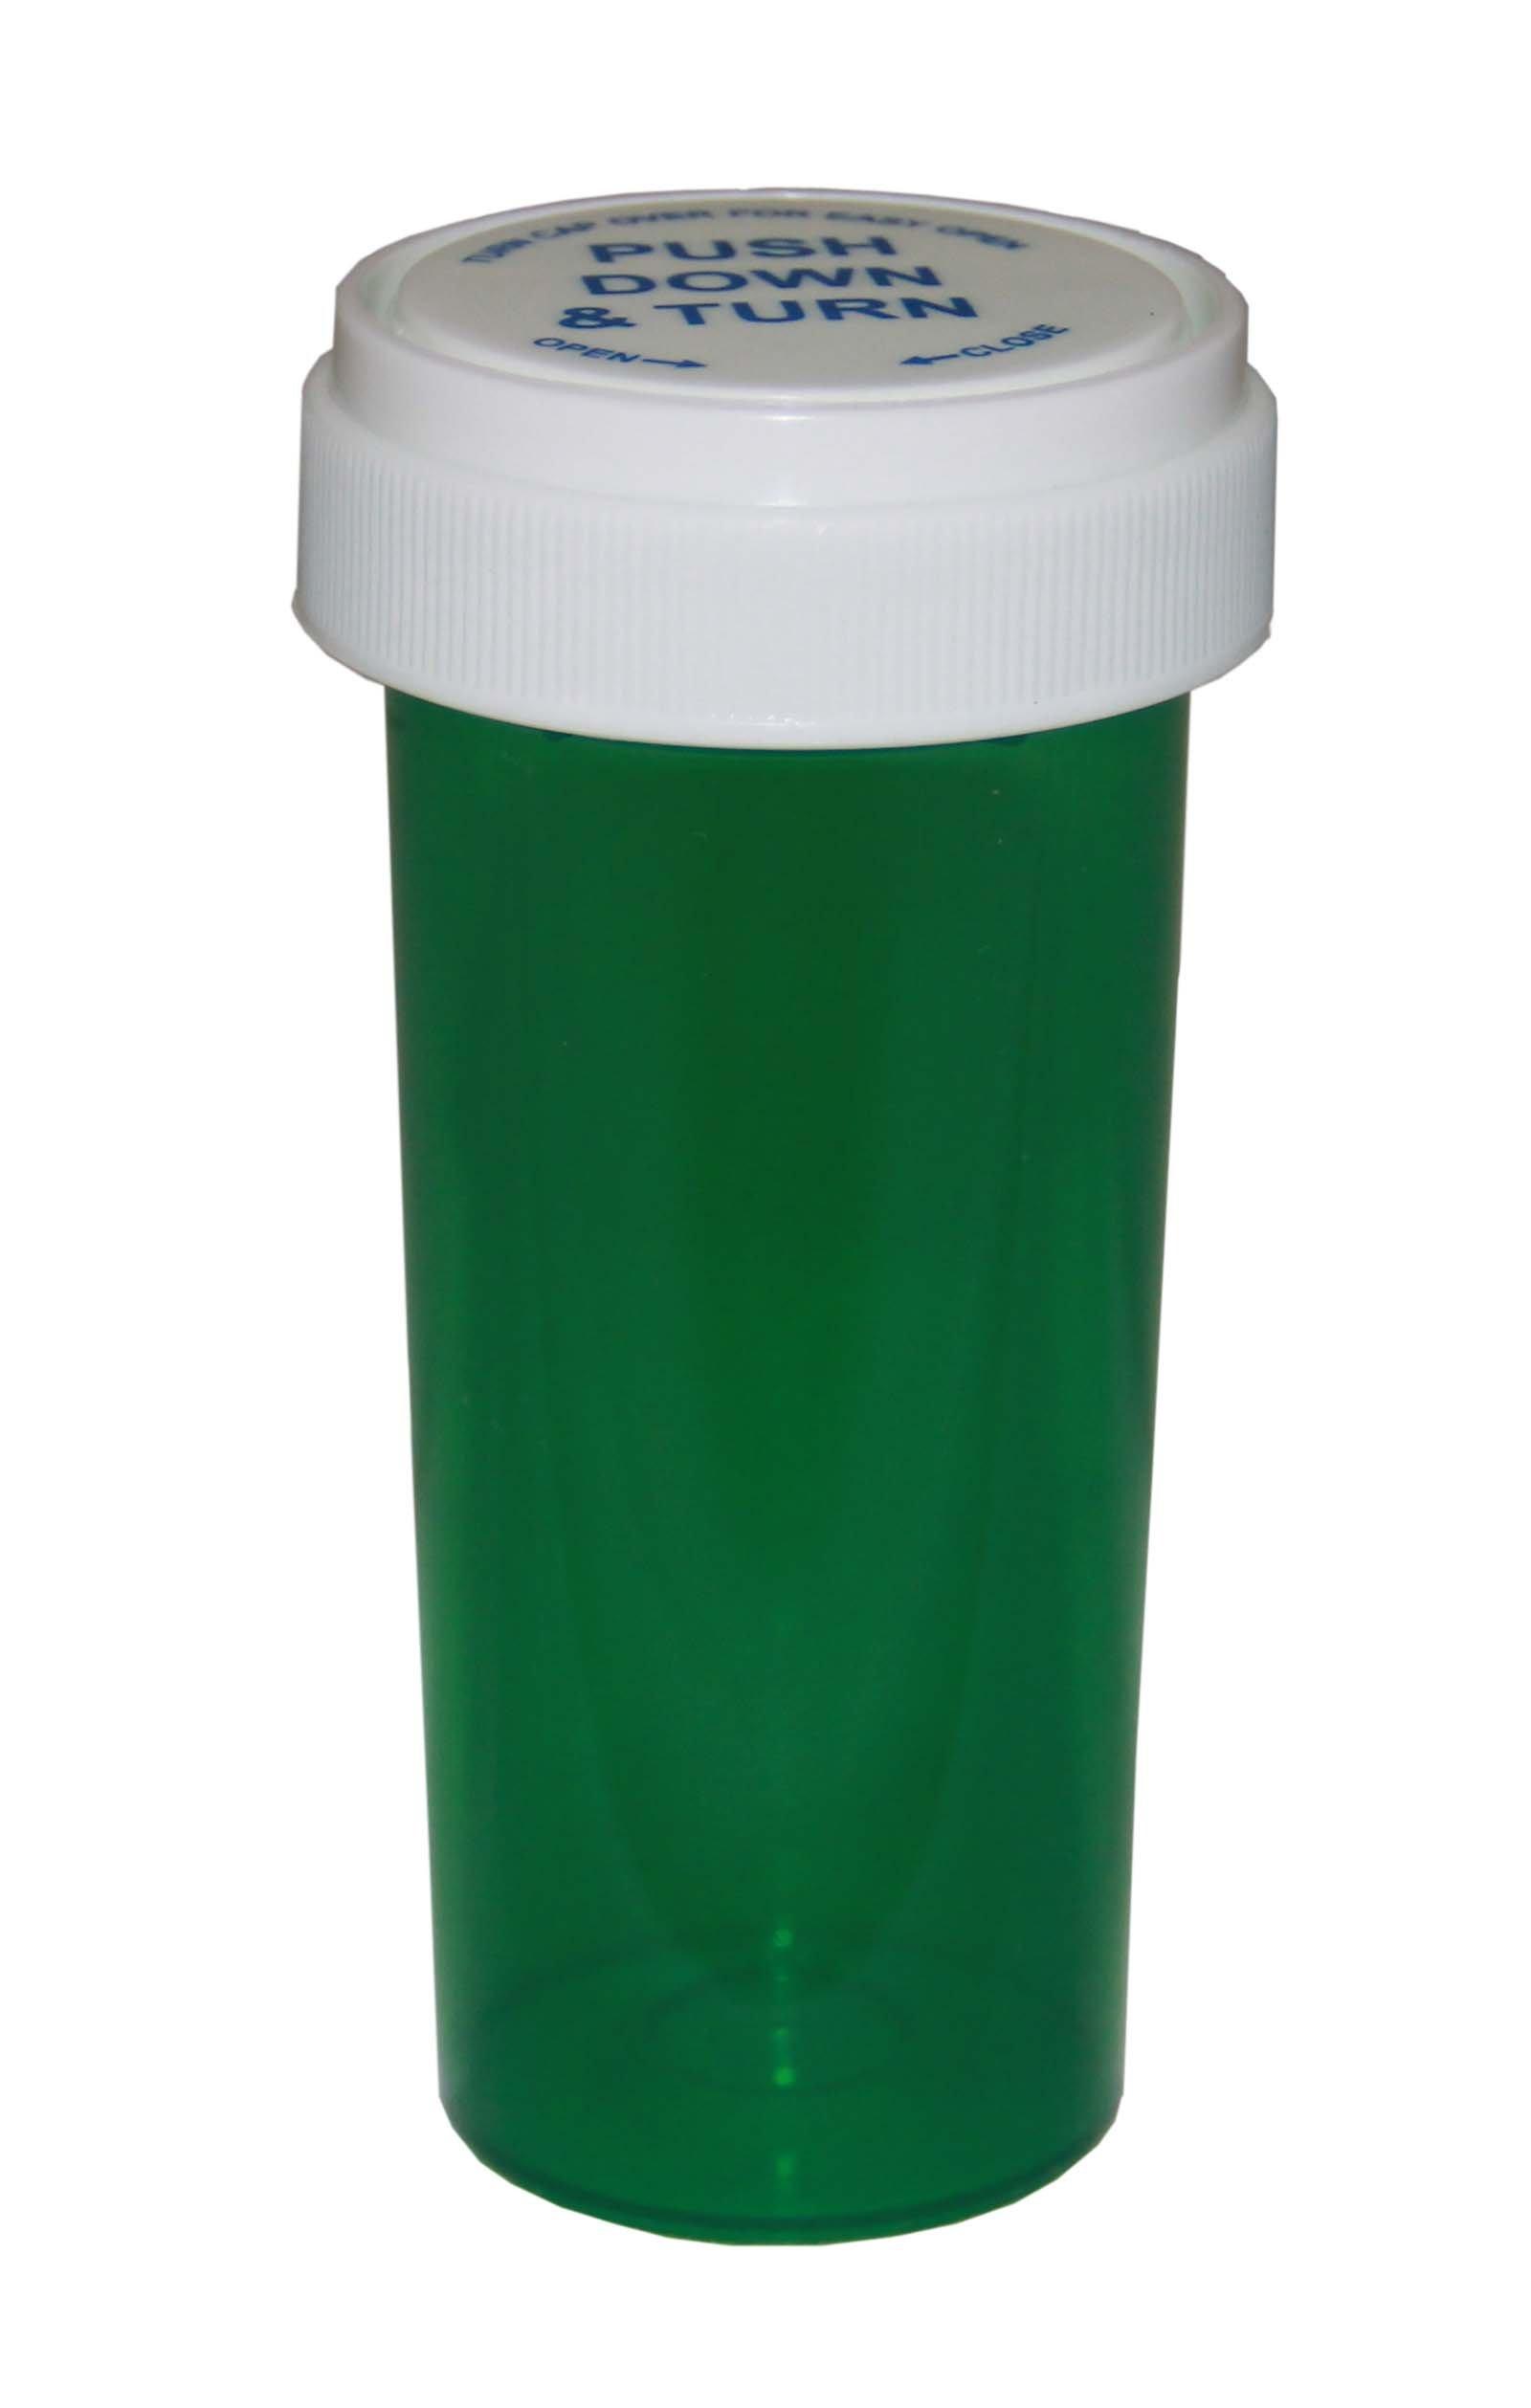 Prescription Pharmacy Vials - Green Child Resistant Medicine Bottle -30 Dram- Reversible Caps-Pack of 200 -Medicine & Pill Container, Pharmacy Bottle, Pharmacy Container, Plastic Container